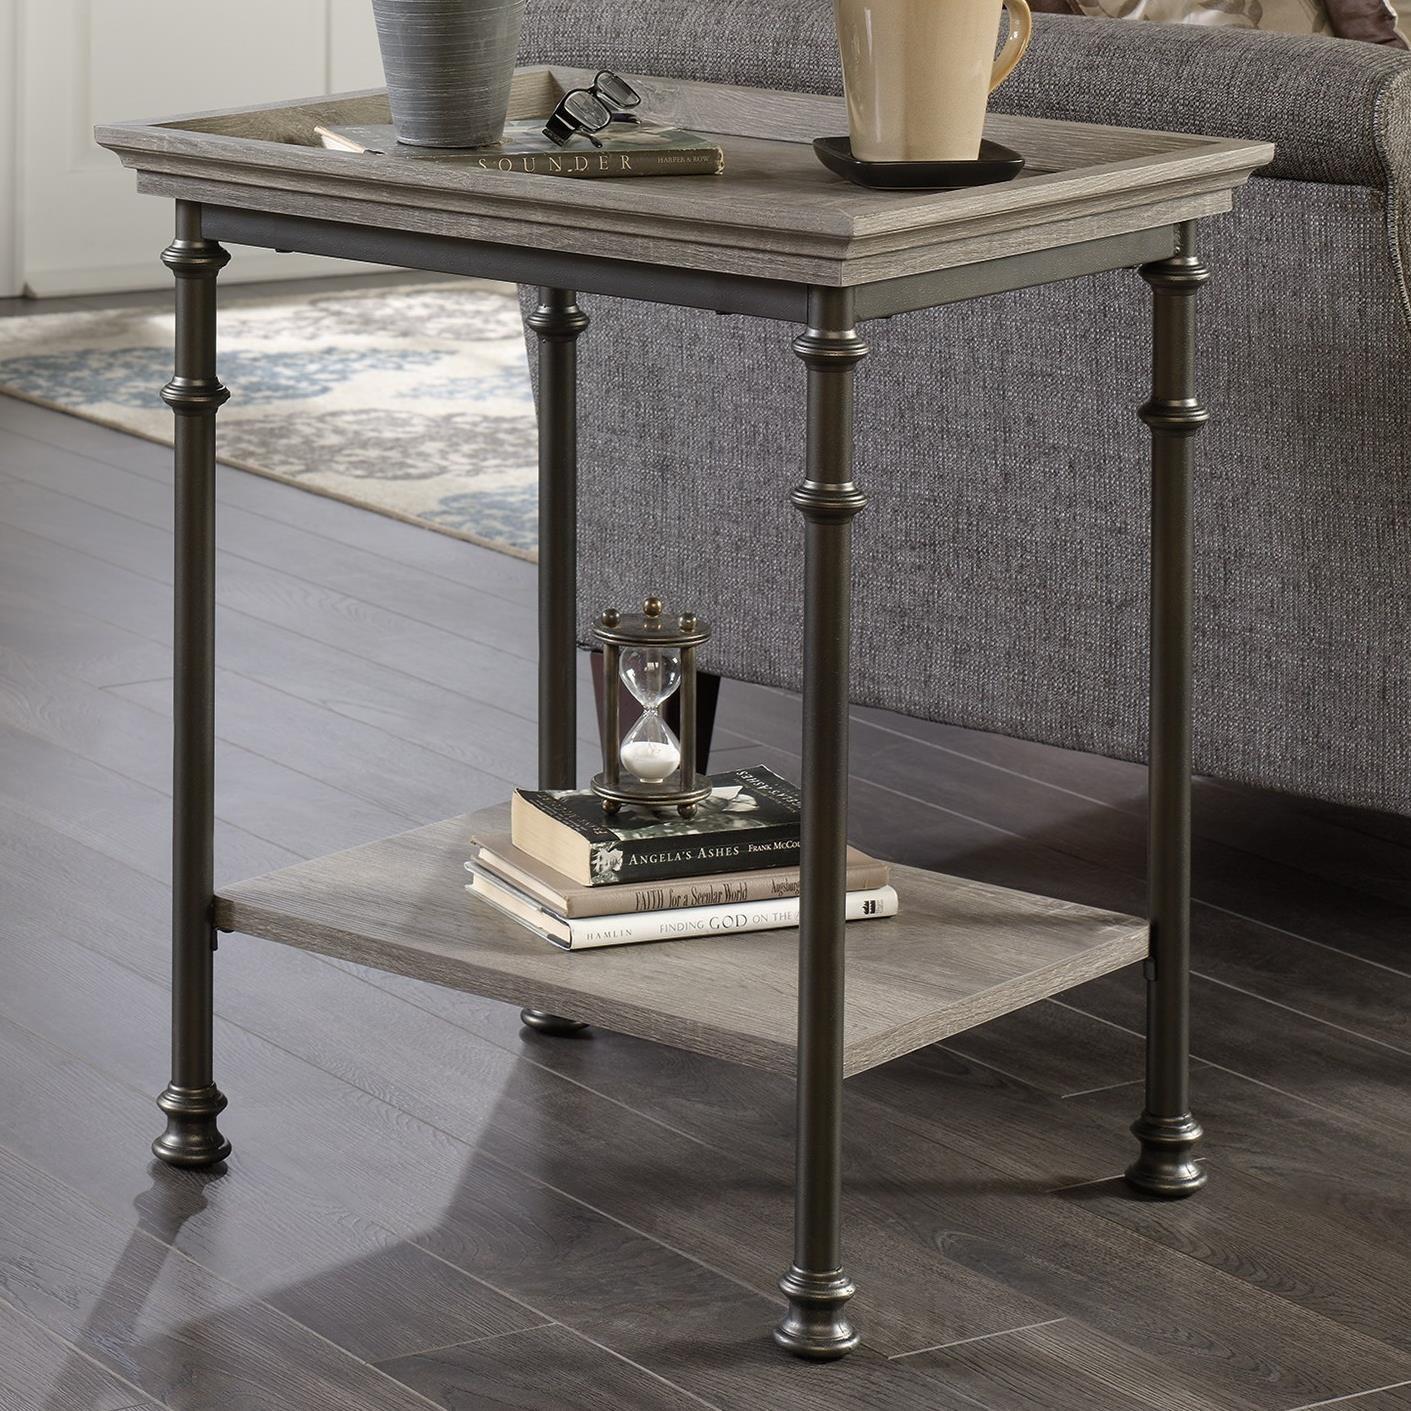 vintage industrial simmons metal side table. Sauder Canal Street Side Table - Item Number: 419229 Vintage Industrial Simmons Metal